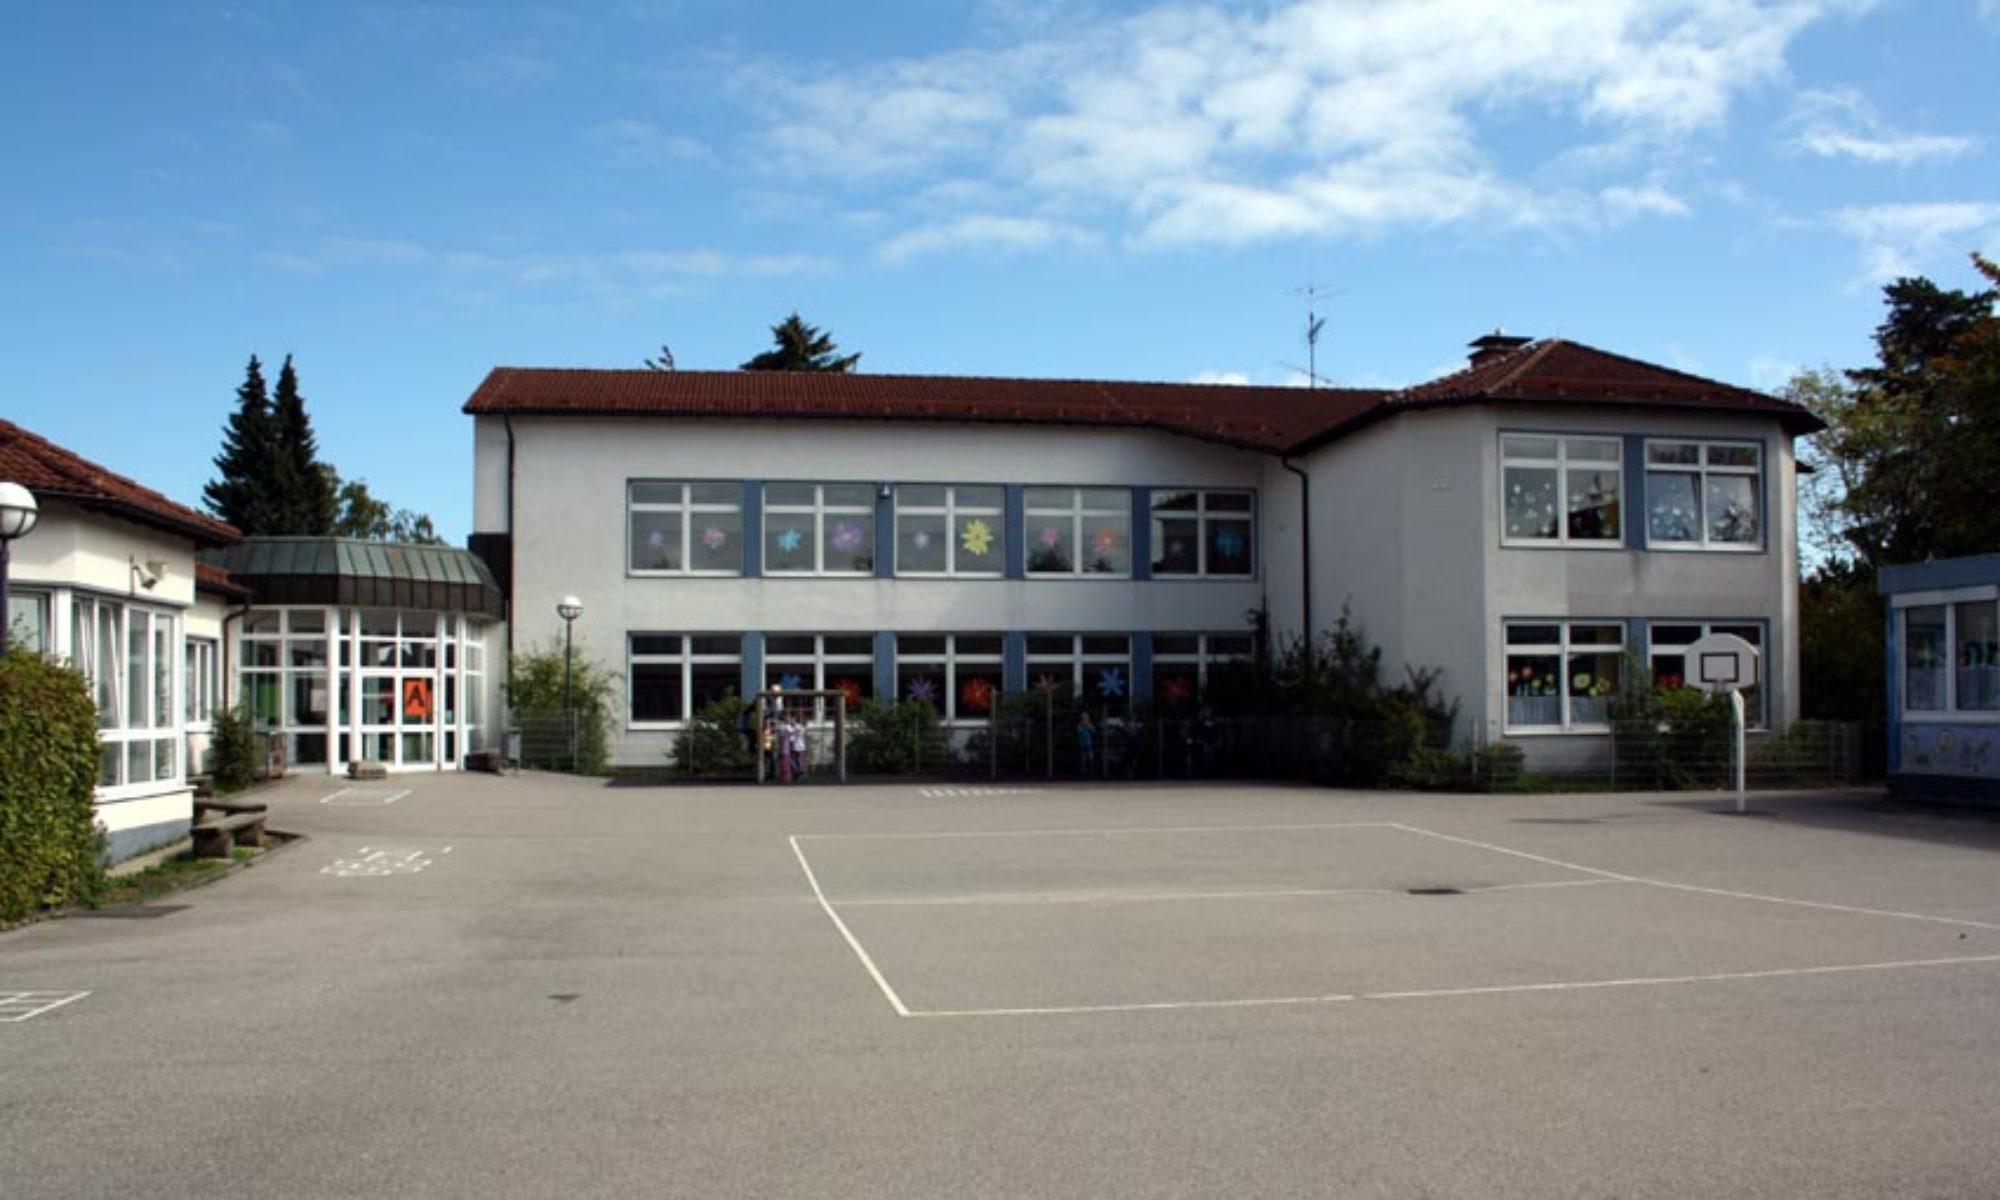 Grundschule Bierbaum